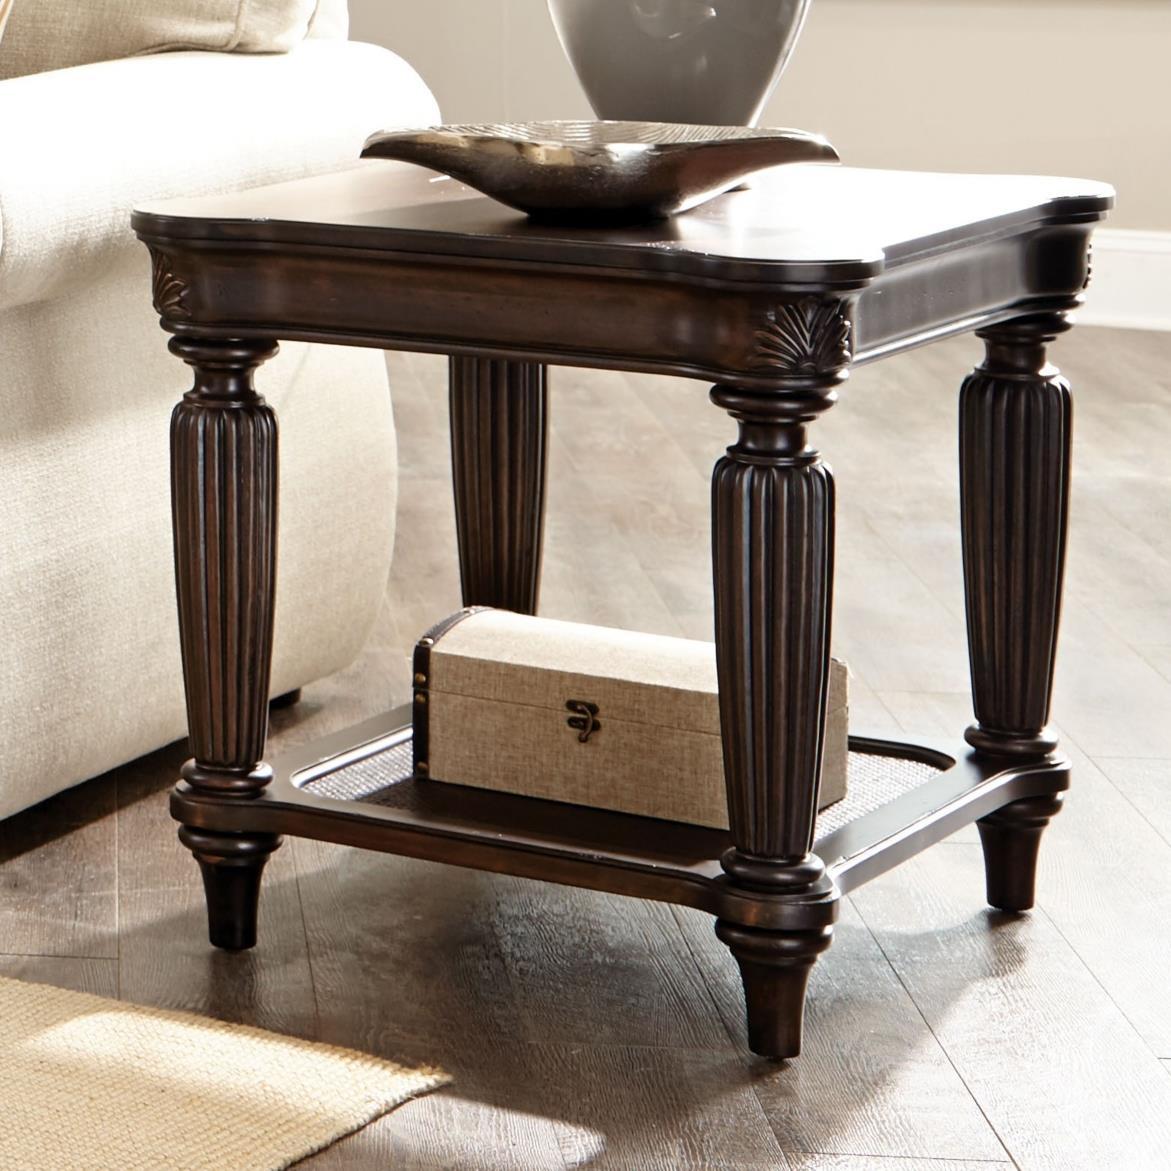 Broyhill Furniture Jessa End Table - Item Number: 4980-002